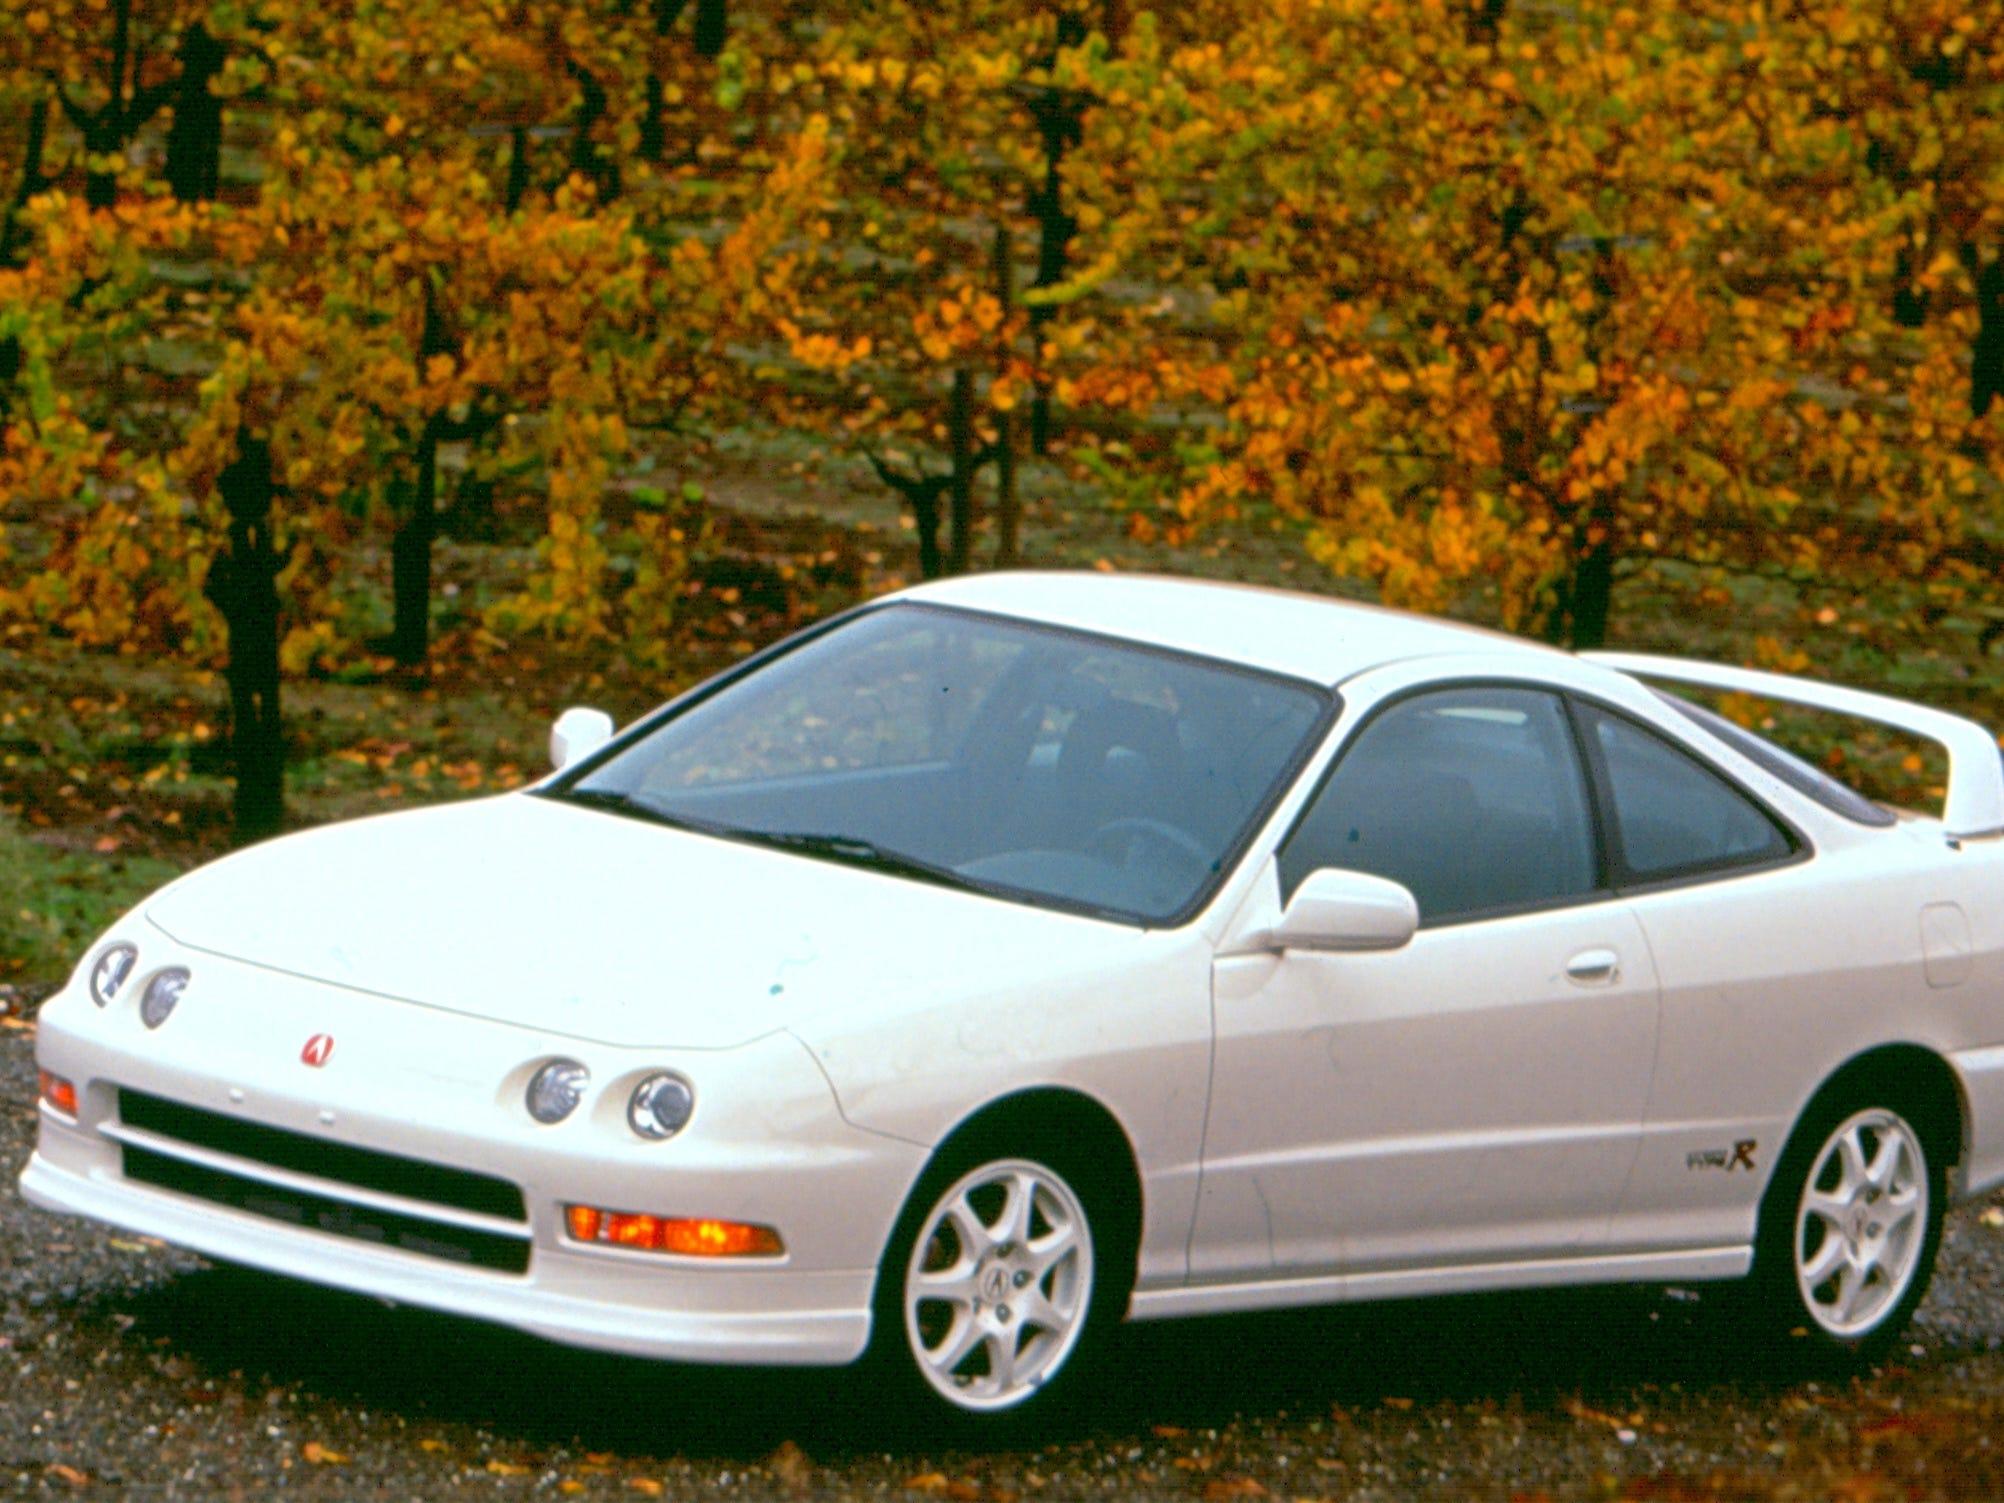 The 1998 Acura Integra Type R.